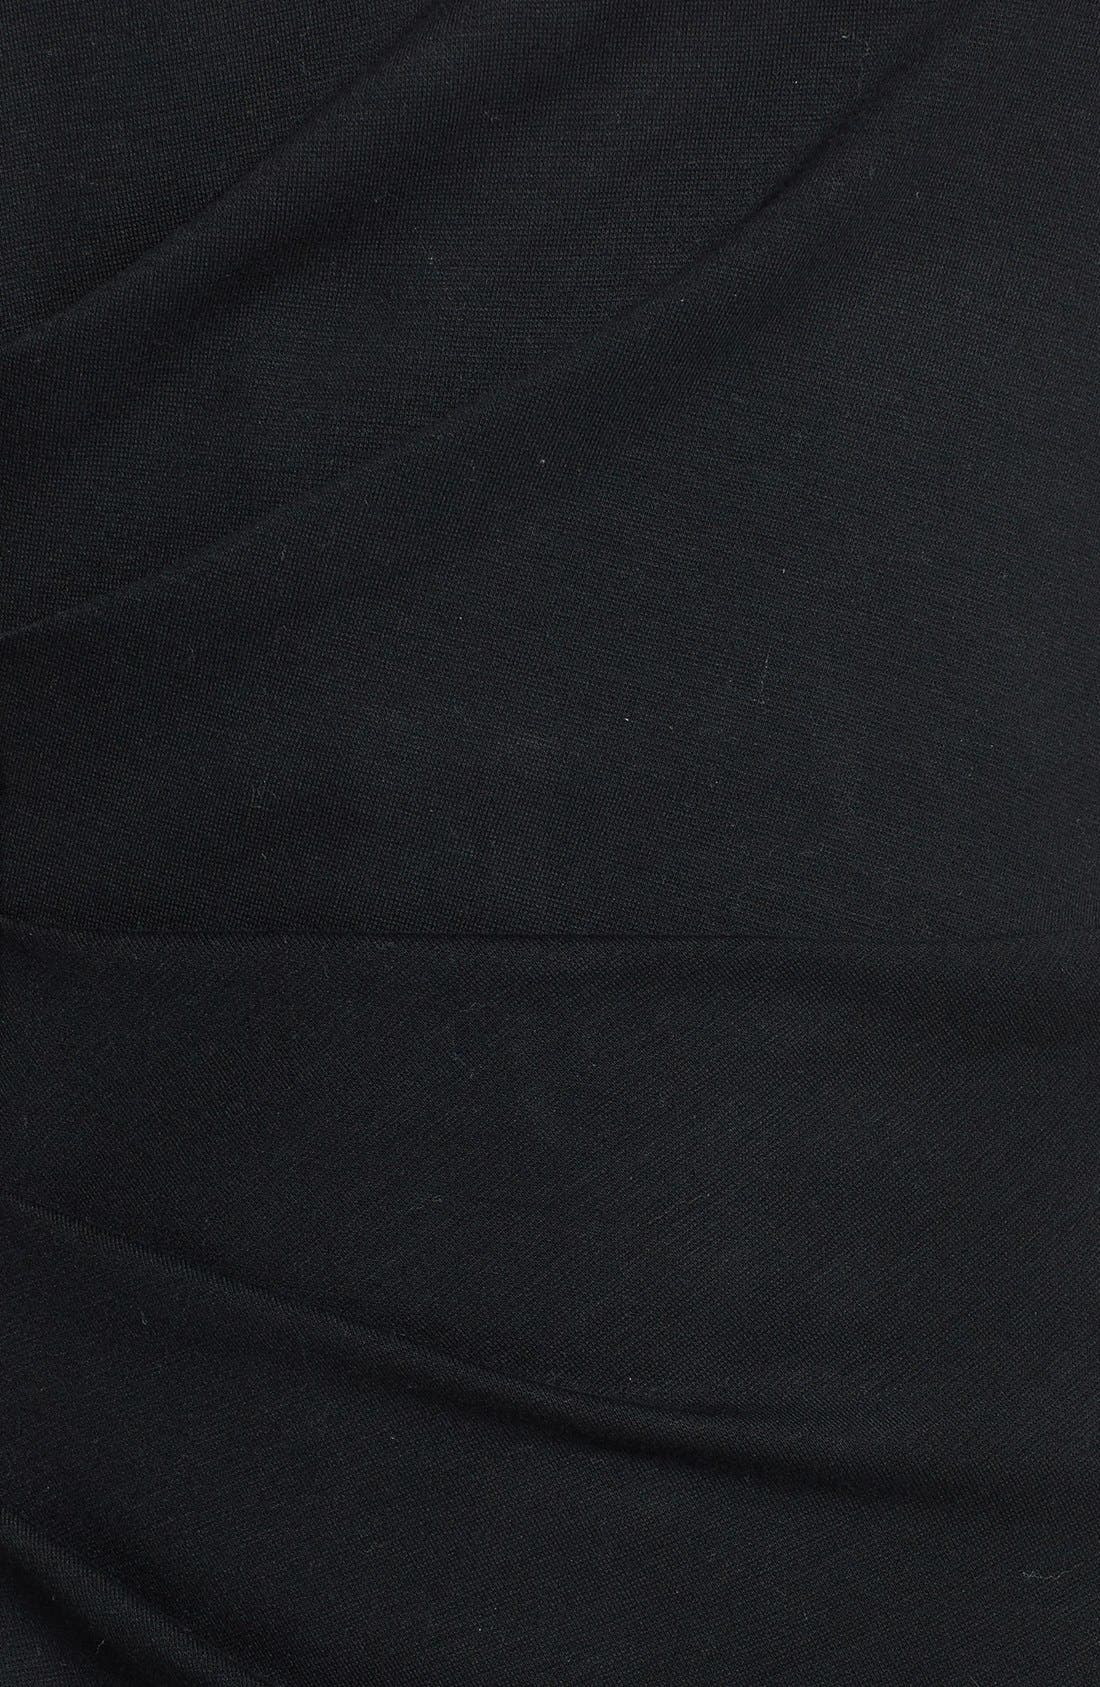 Alternate Image 3  - Milly 'Tucked' Jersey Sheath Dress